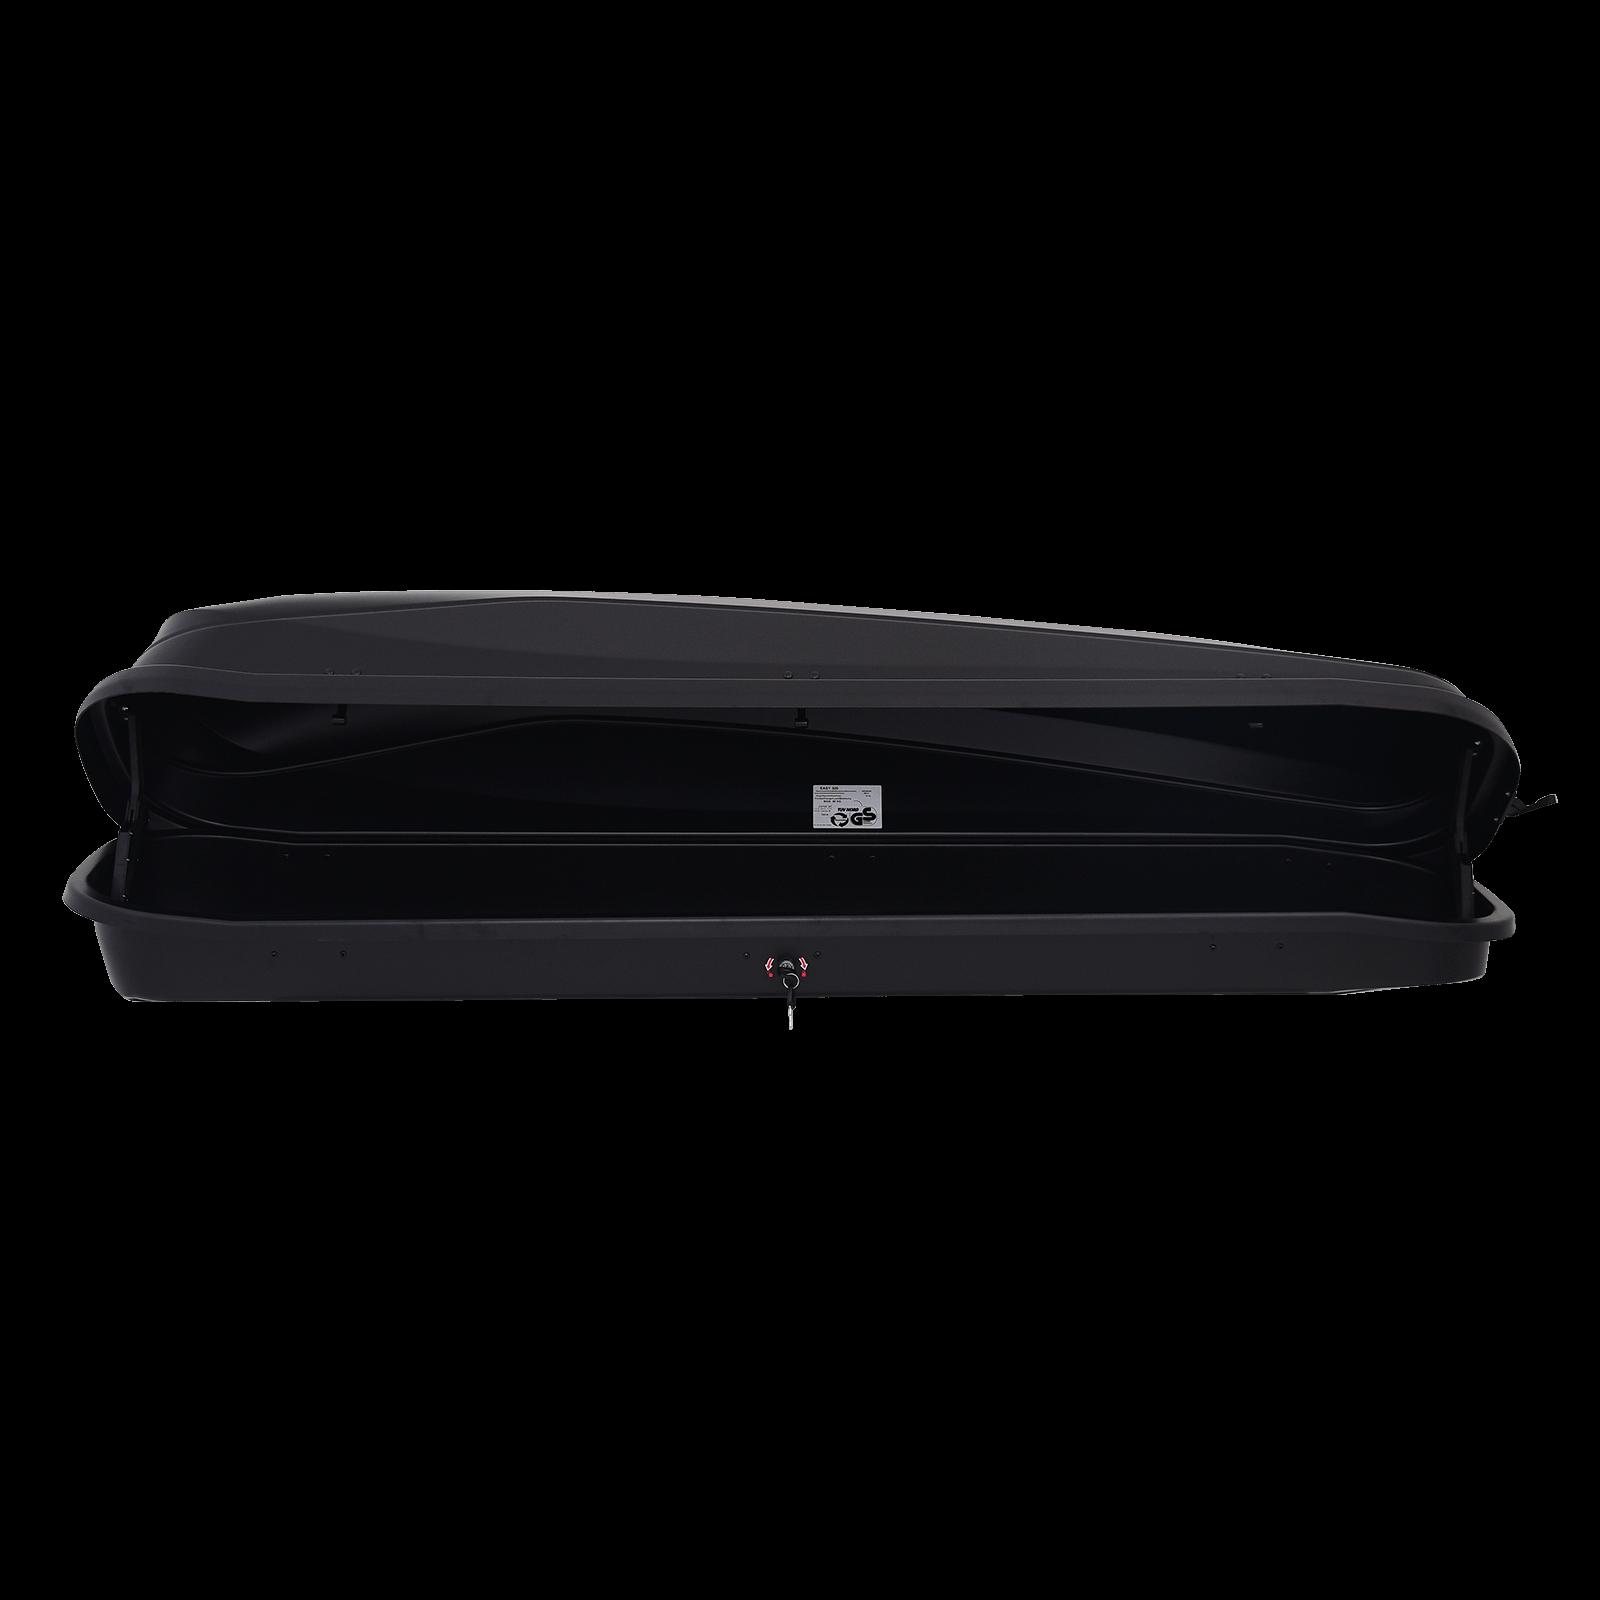 Dachbox Junior Easy 300 schwarz matt - Bild 2